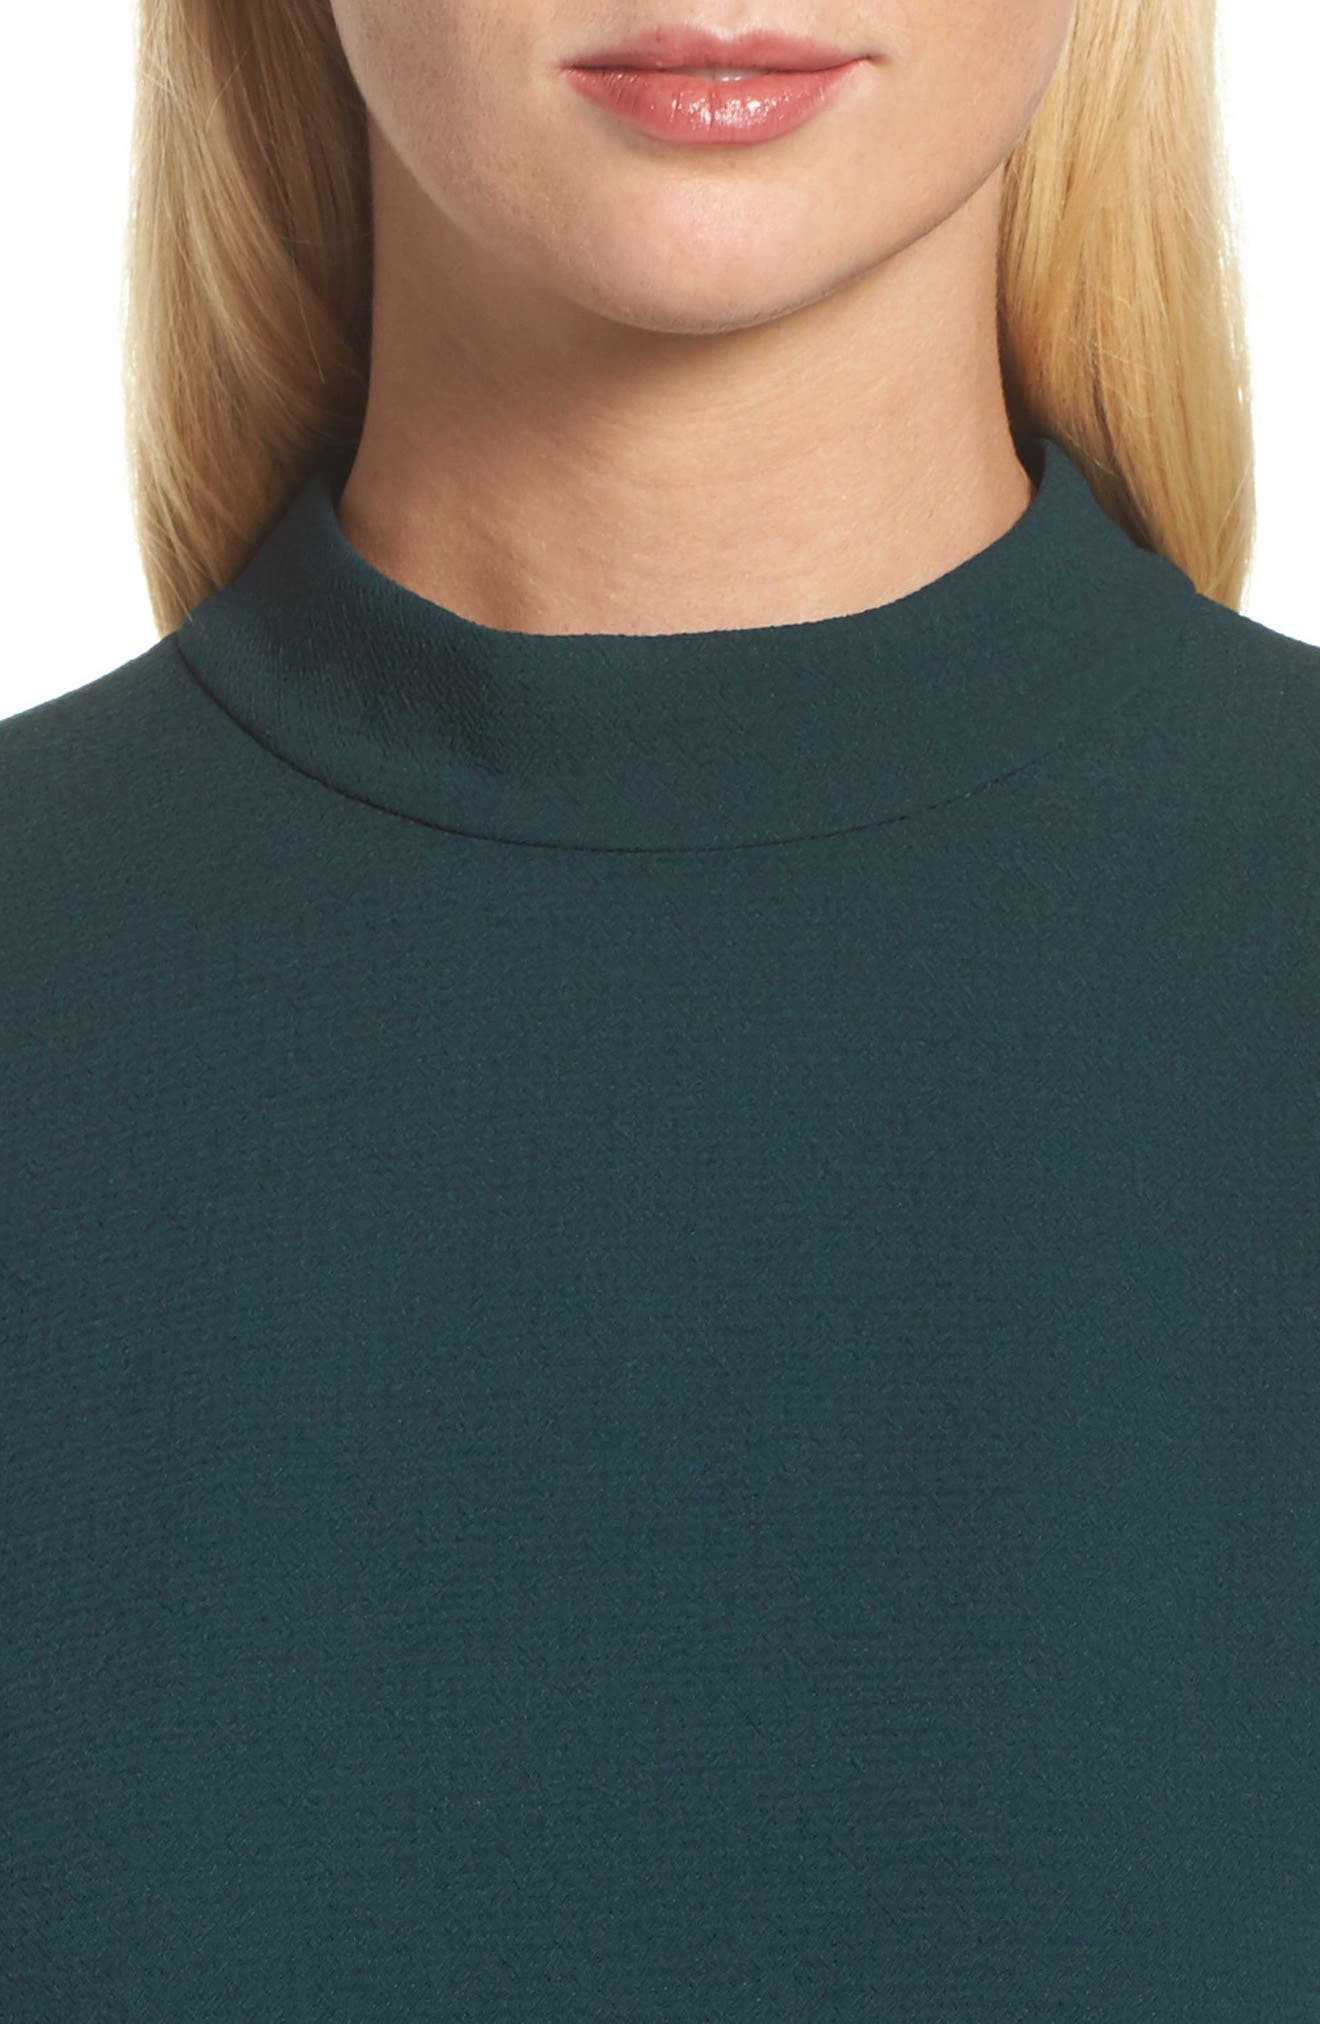 Bishop Sleeve Shift Dress,                             Alternate thumbnail 4, color,                             302